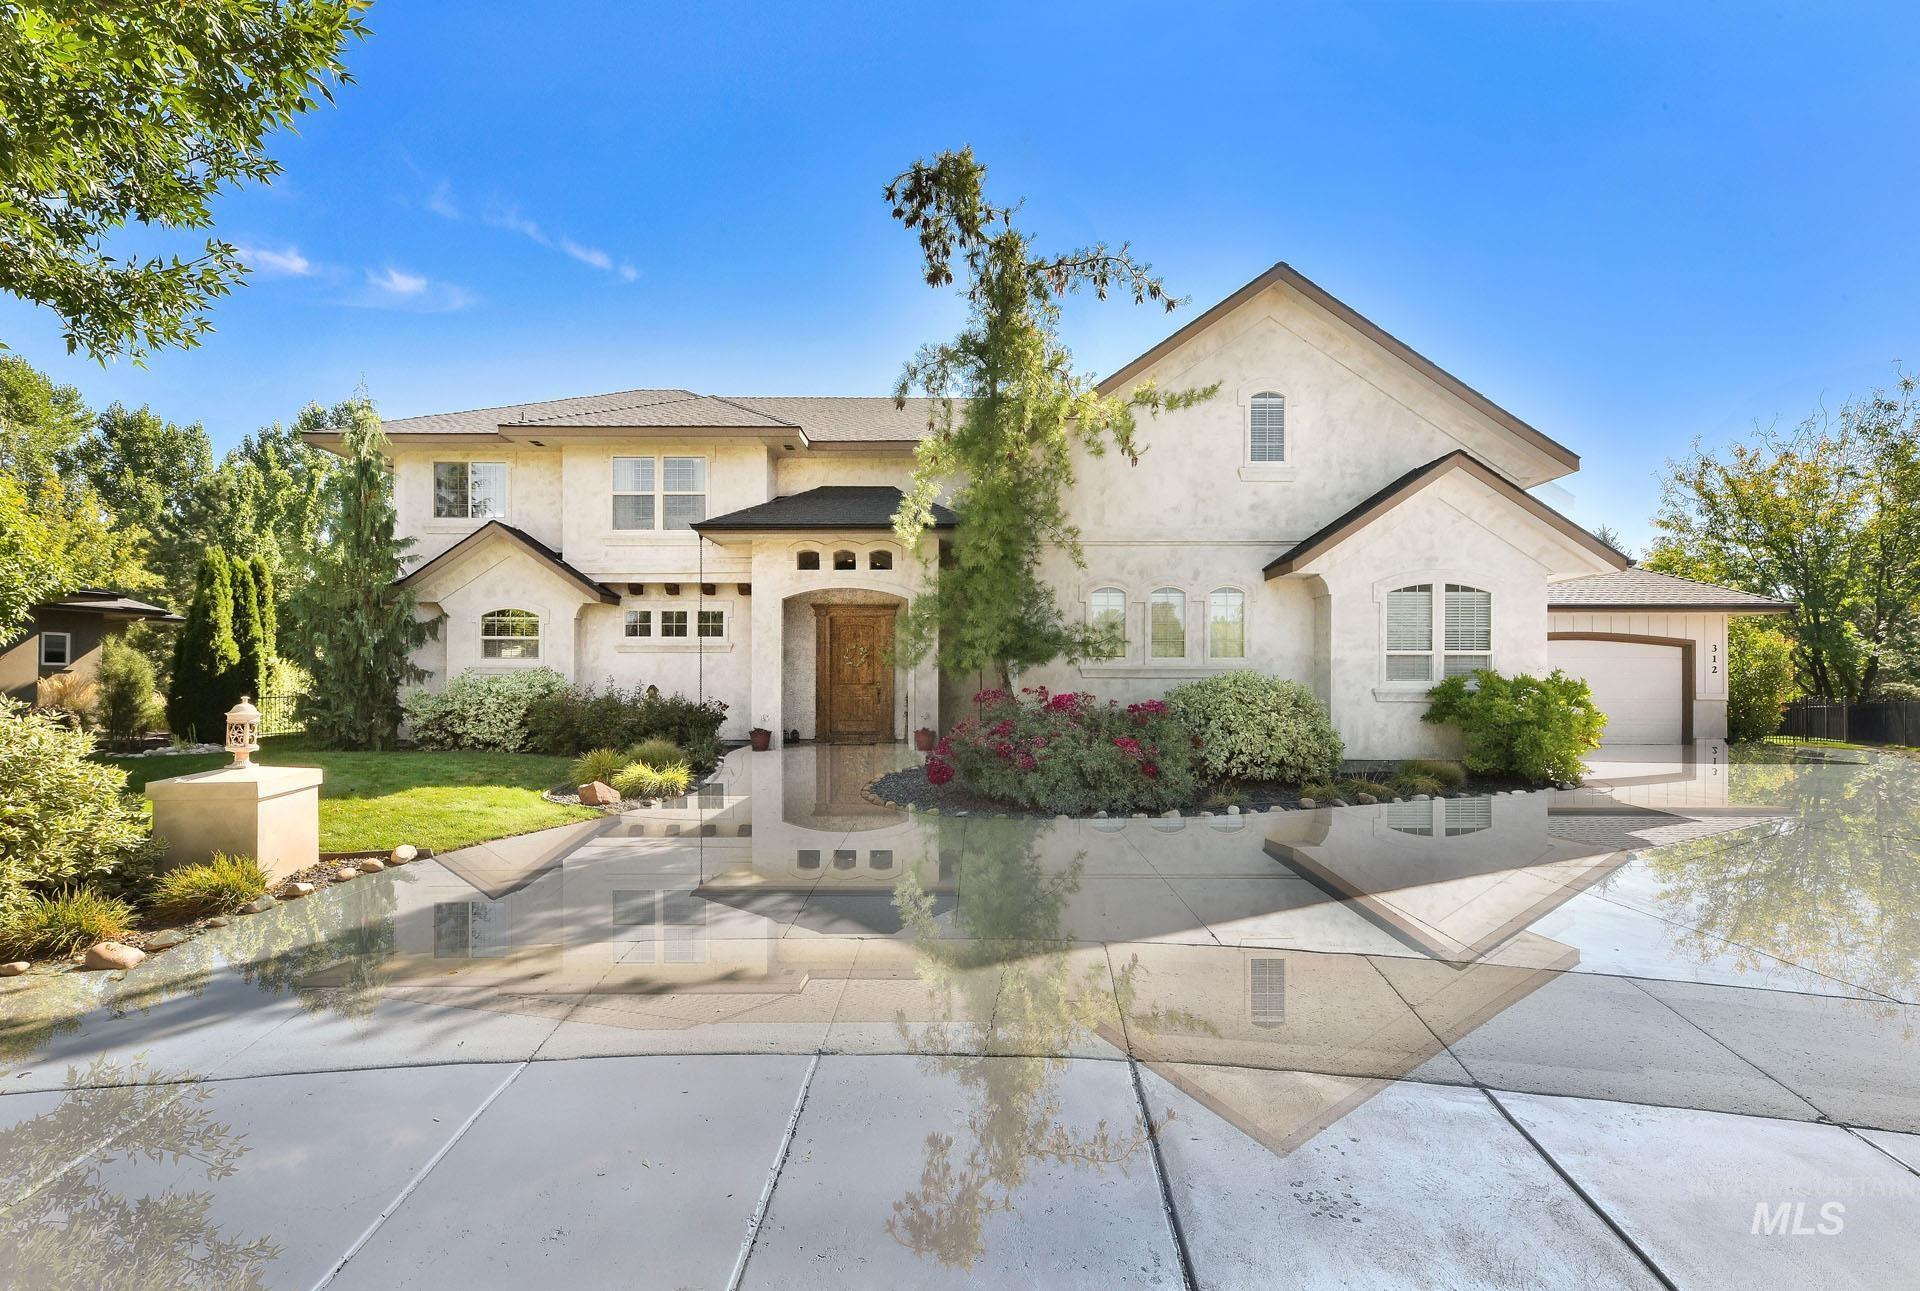 312 W Crystal Brook Property Photo 1